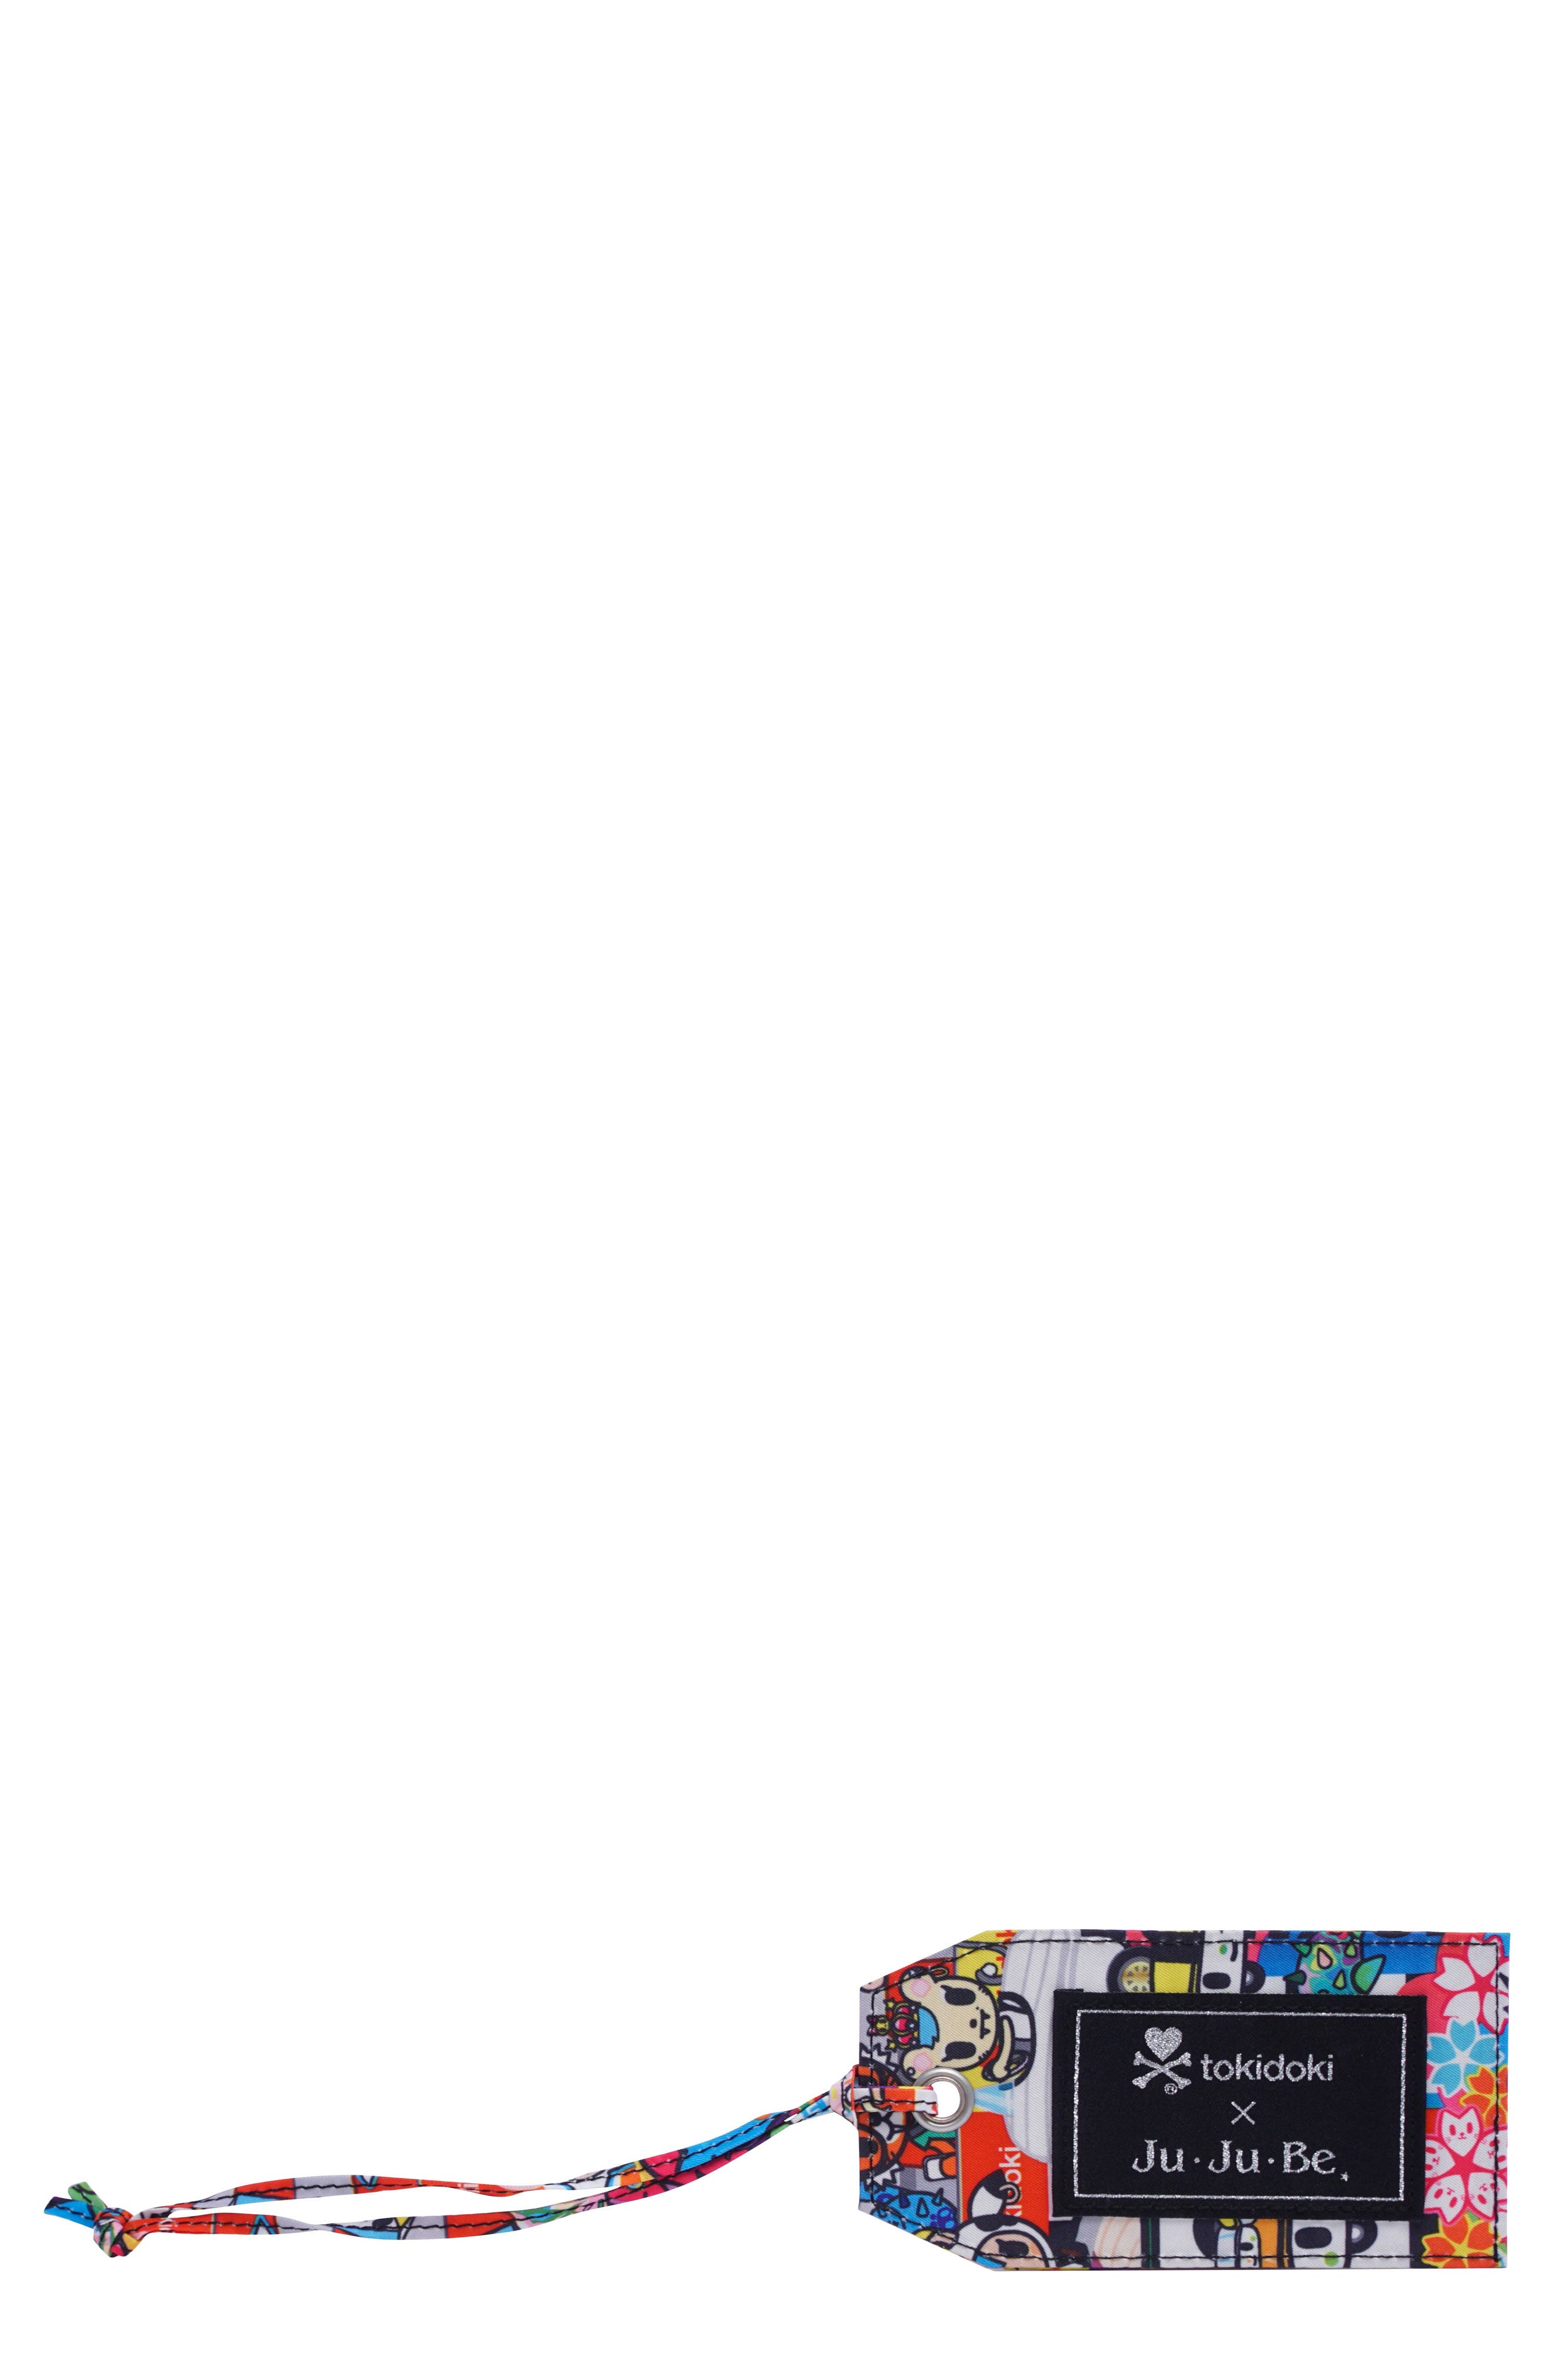 Main Image - Ju-Ju-Be x tokidoki for Hello Sanrio Rainbow Dreams Be Tagged Luggage Tag